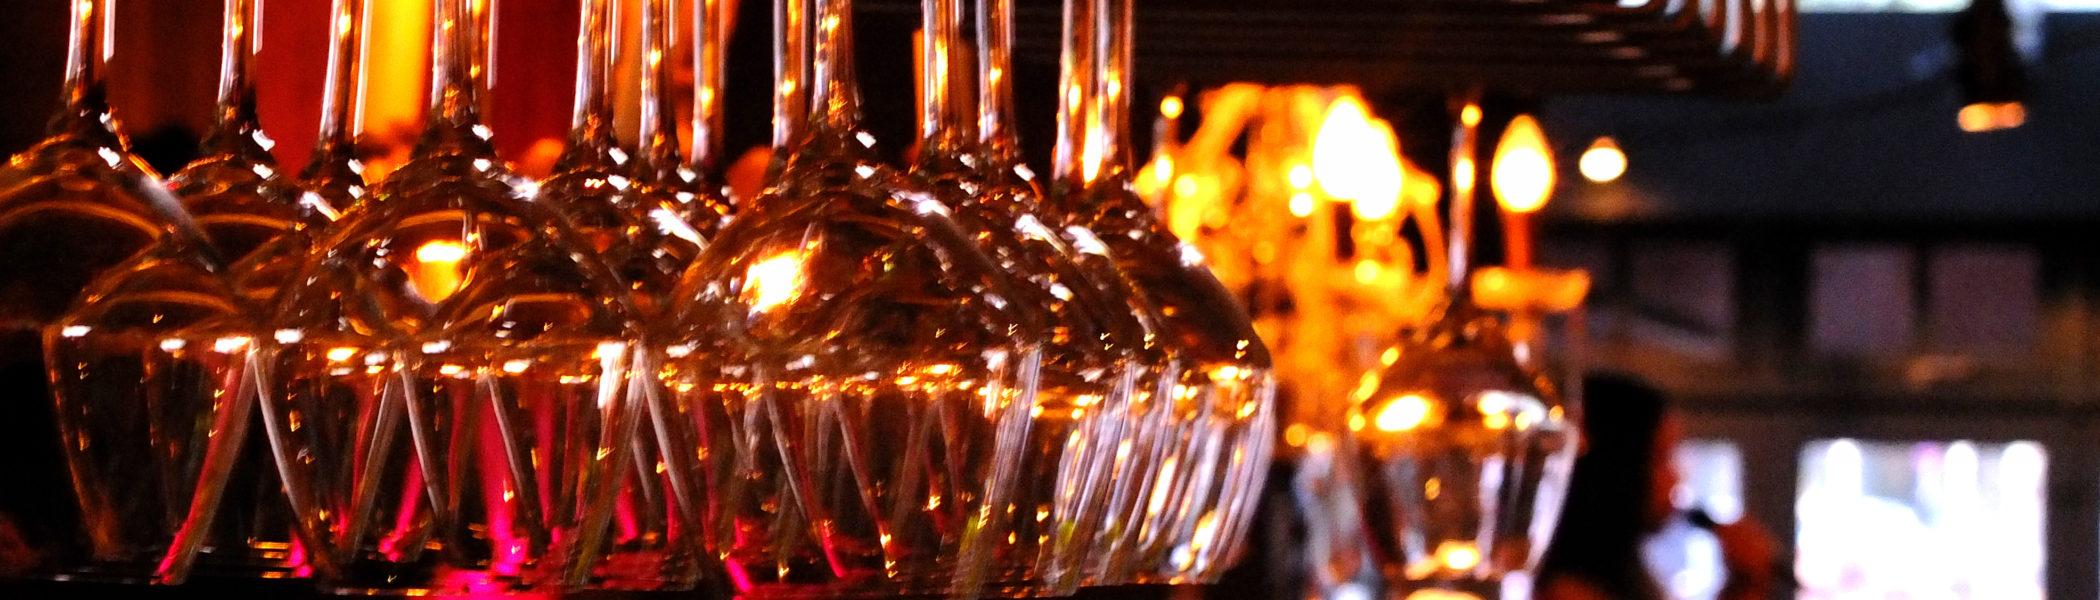 restaurant-zaandam-manzo-bar-bistro-wijn-bar-zanger